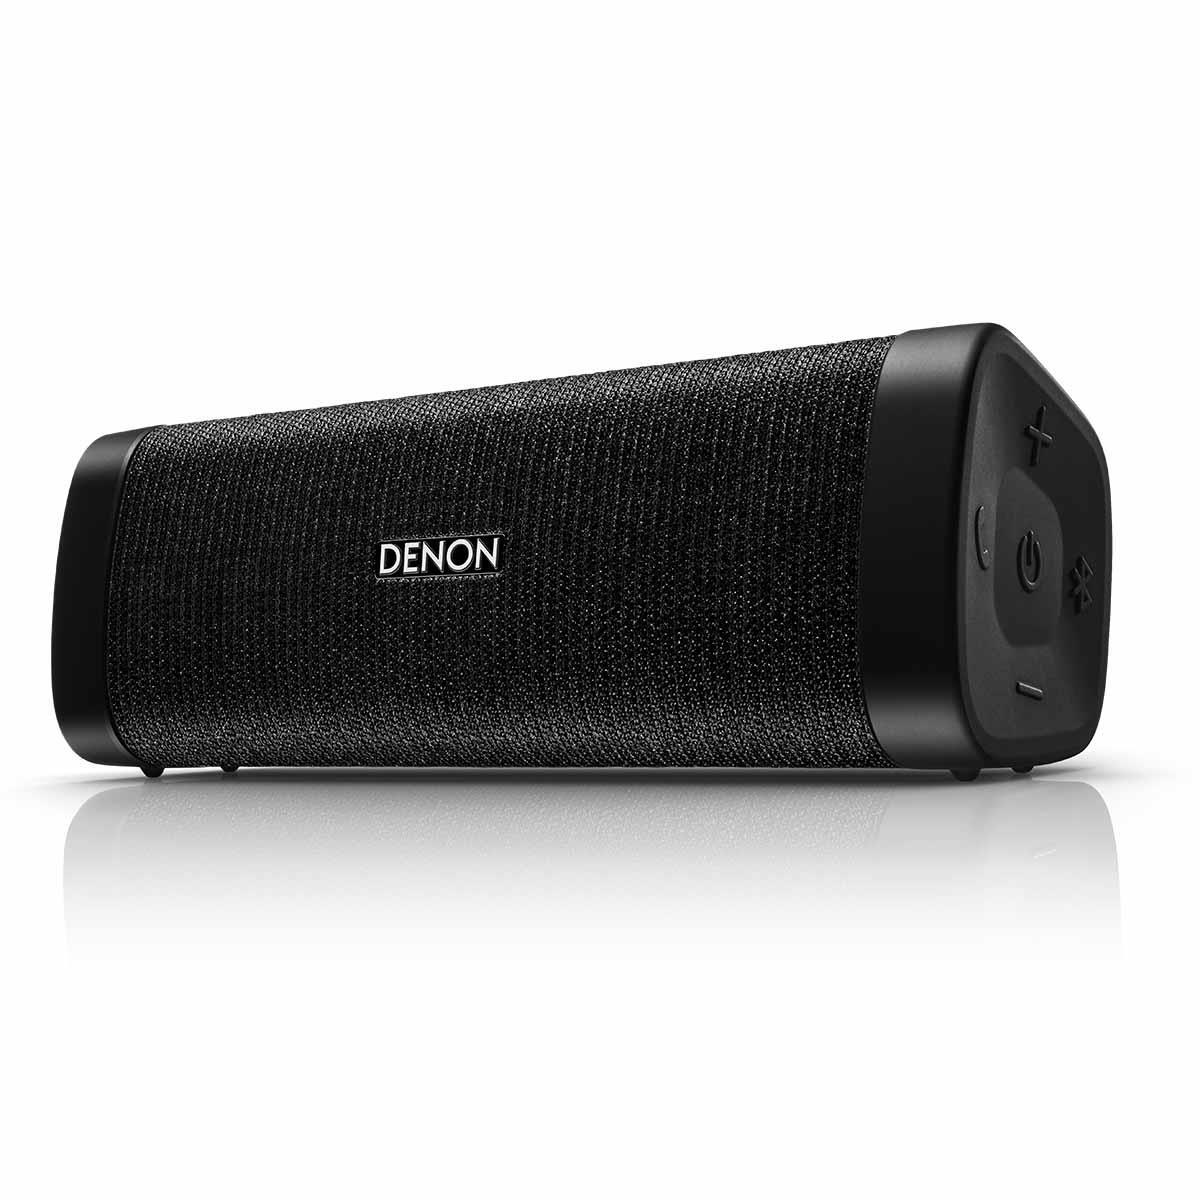 Enceinte Bluetooth Denon Envaya DSB-250BT - Noire